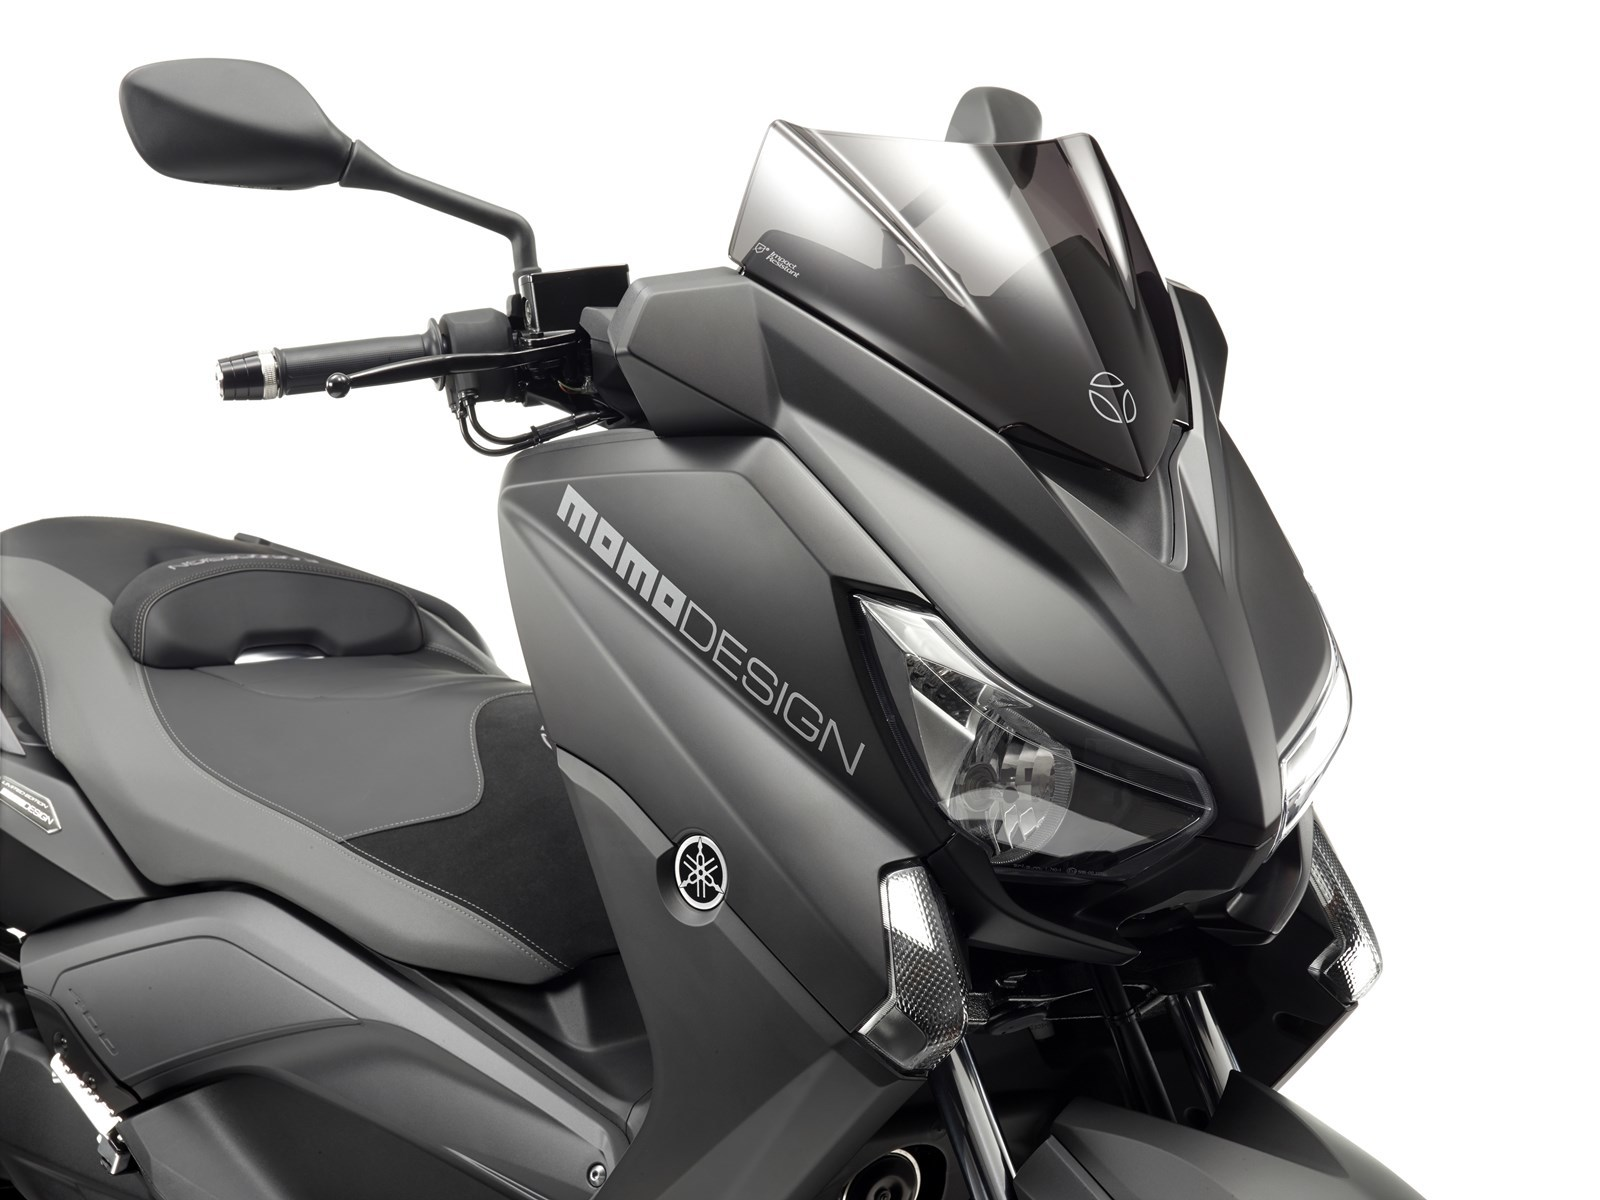 Foto de Yamaha X-MAX 400 MOMODESIGN, estudio y detalles (26/33)